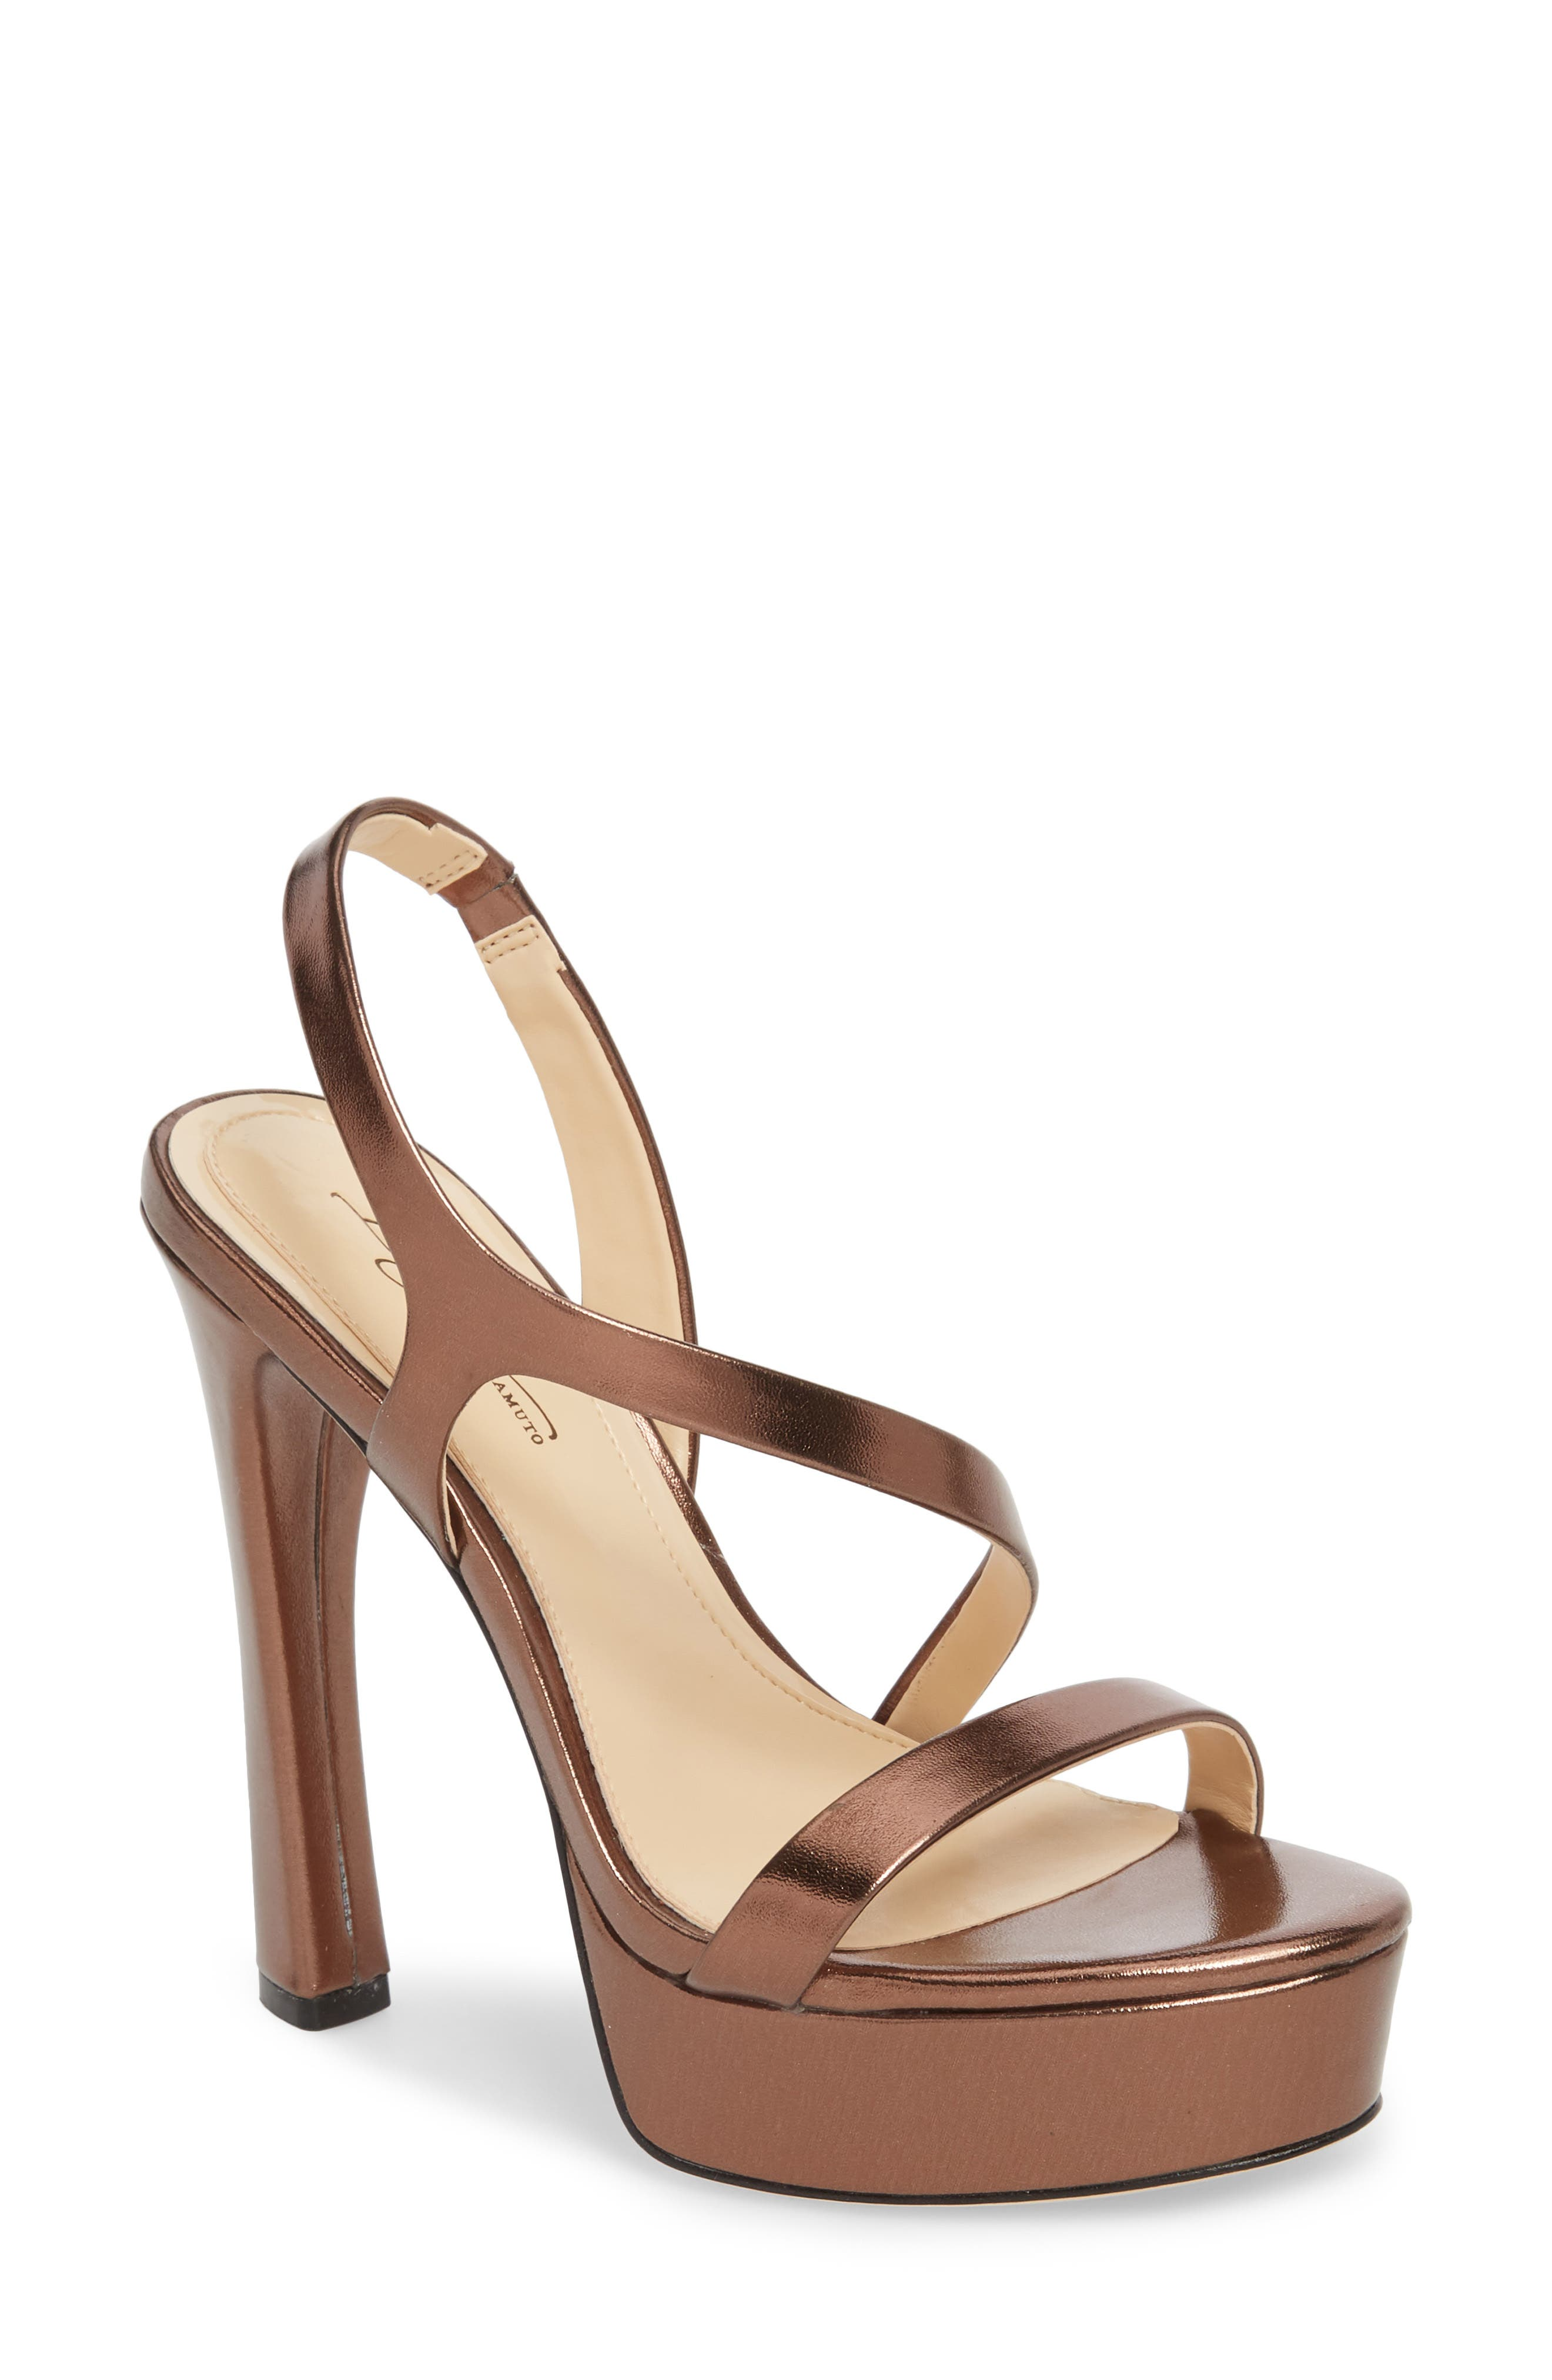 Imagine By Vince Camuto Piera Platform Sandal- Metallic